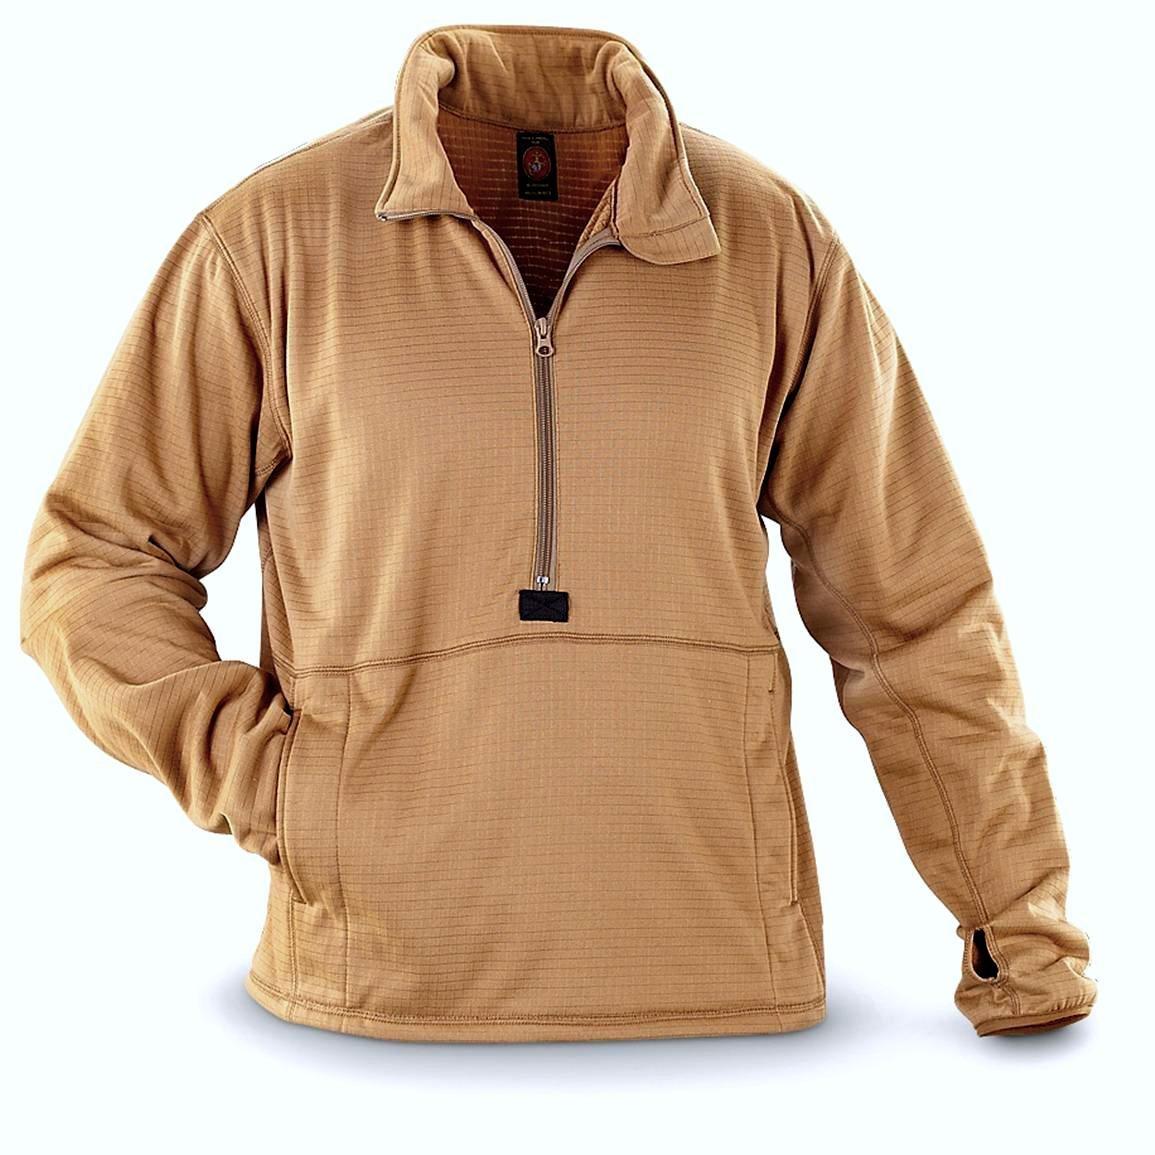 Peckham USMC Issue Military Polartec Grid Fleece Pullover Coyote Brown (Large)